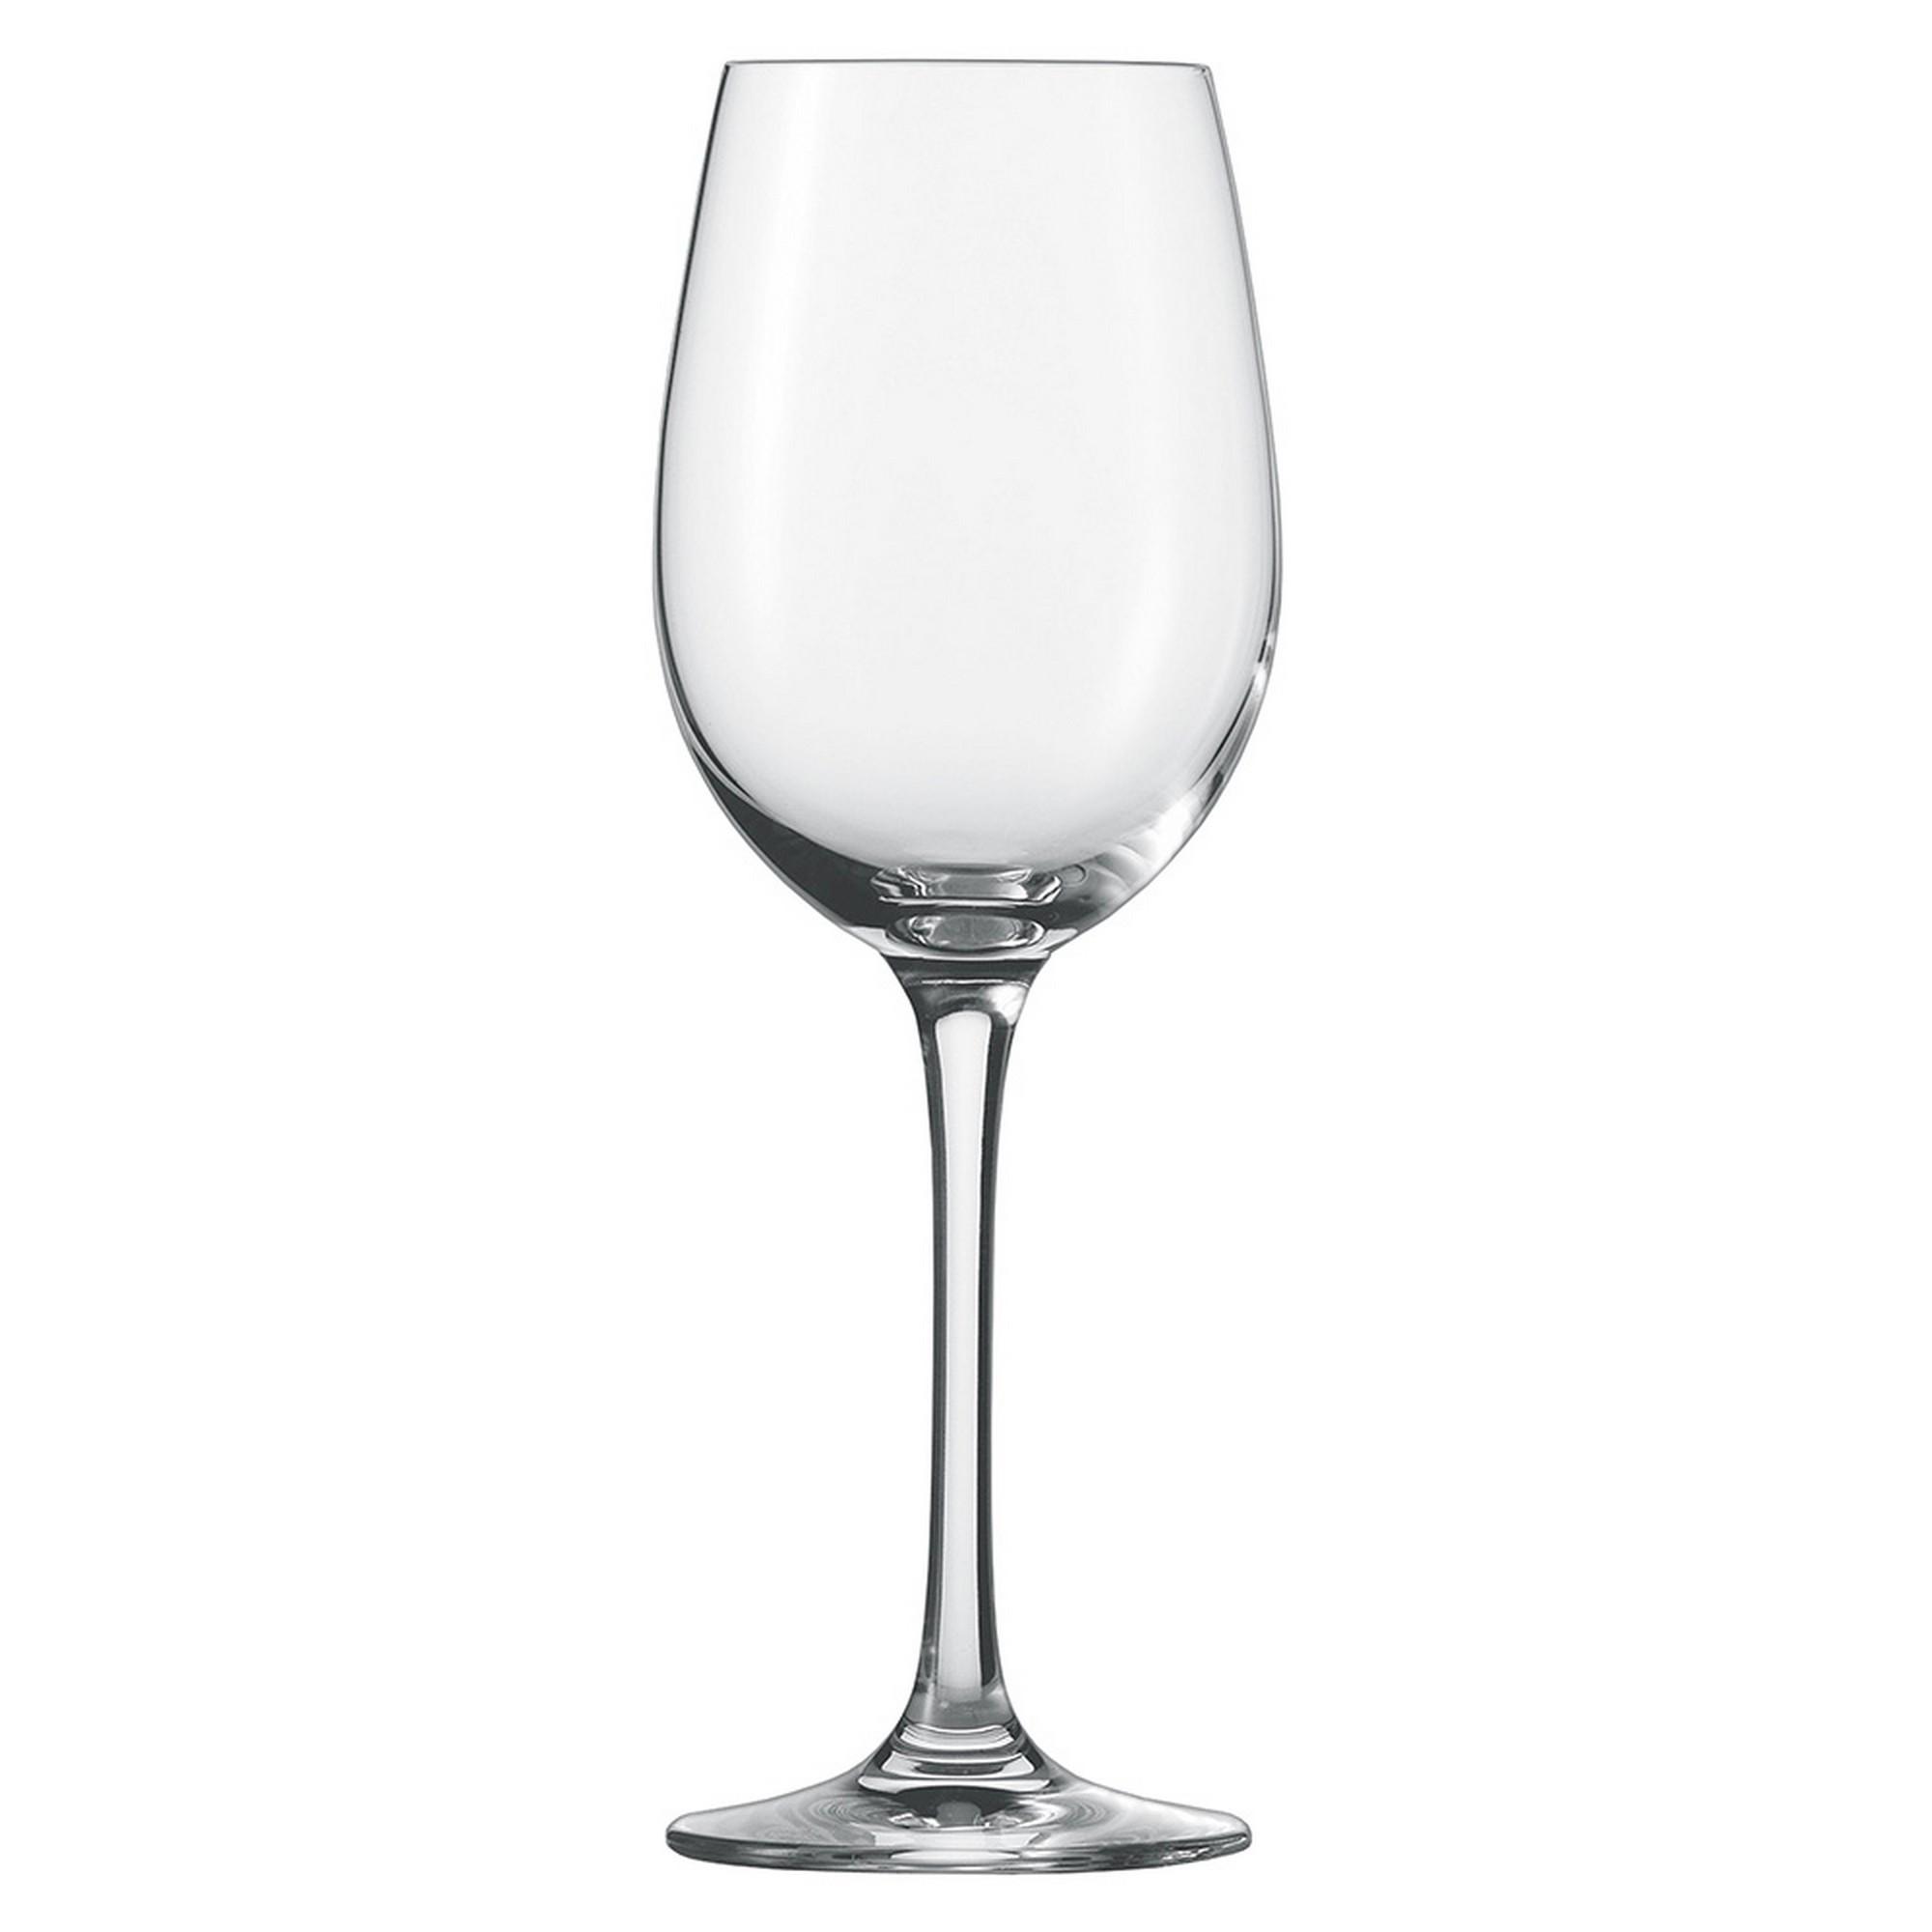 Taça para Vinho Branco 312ml Schott Zwiesel Classico 6 Peças de Cristal